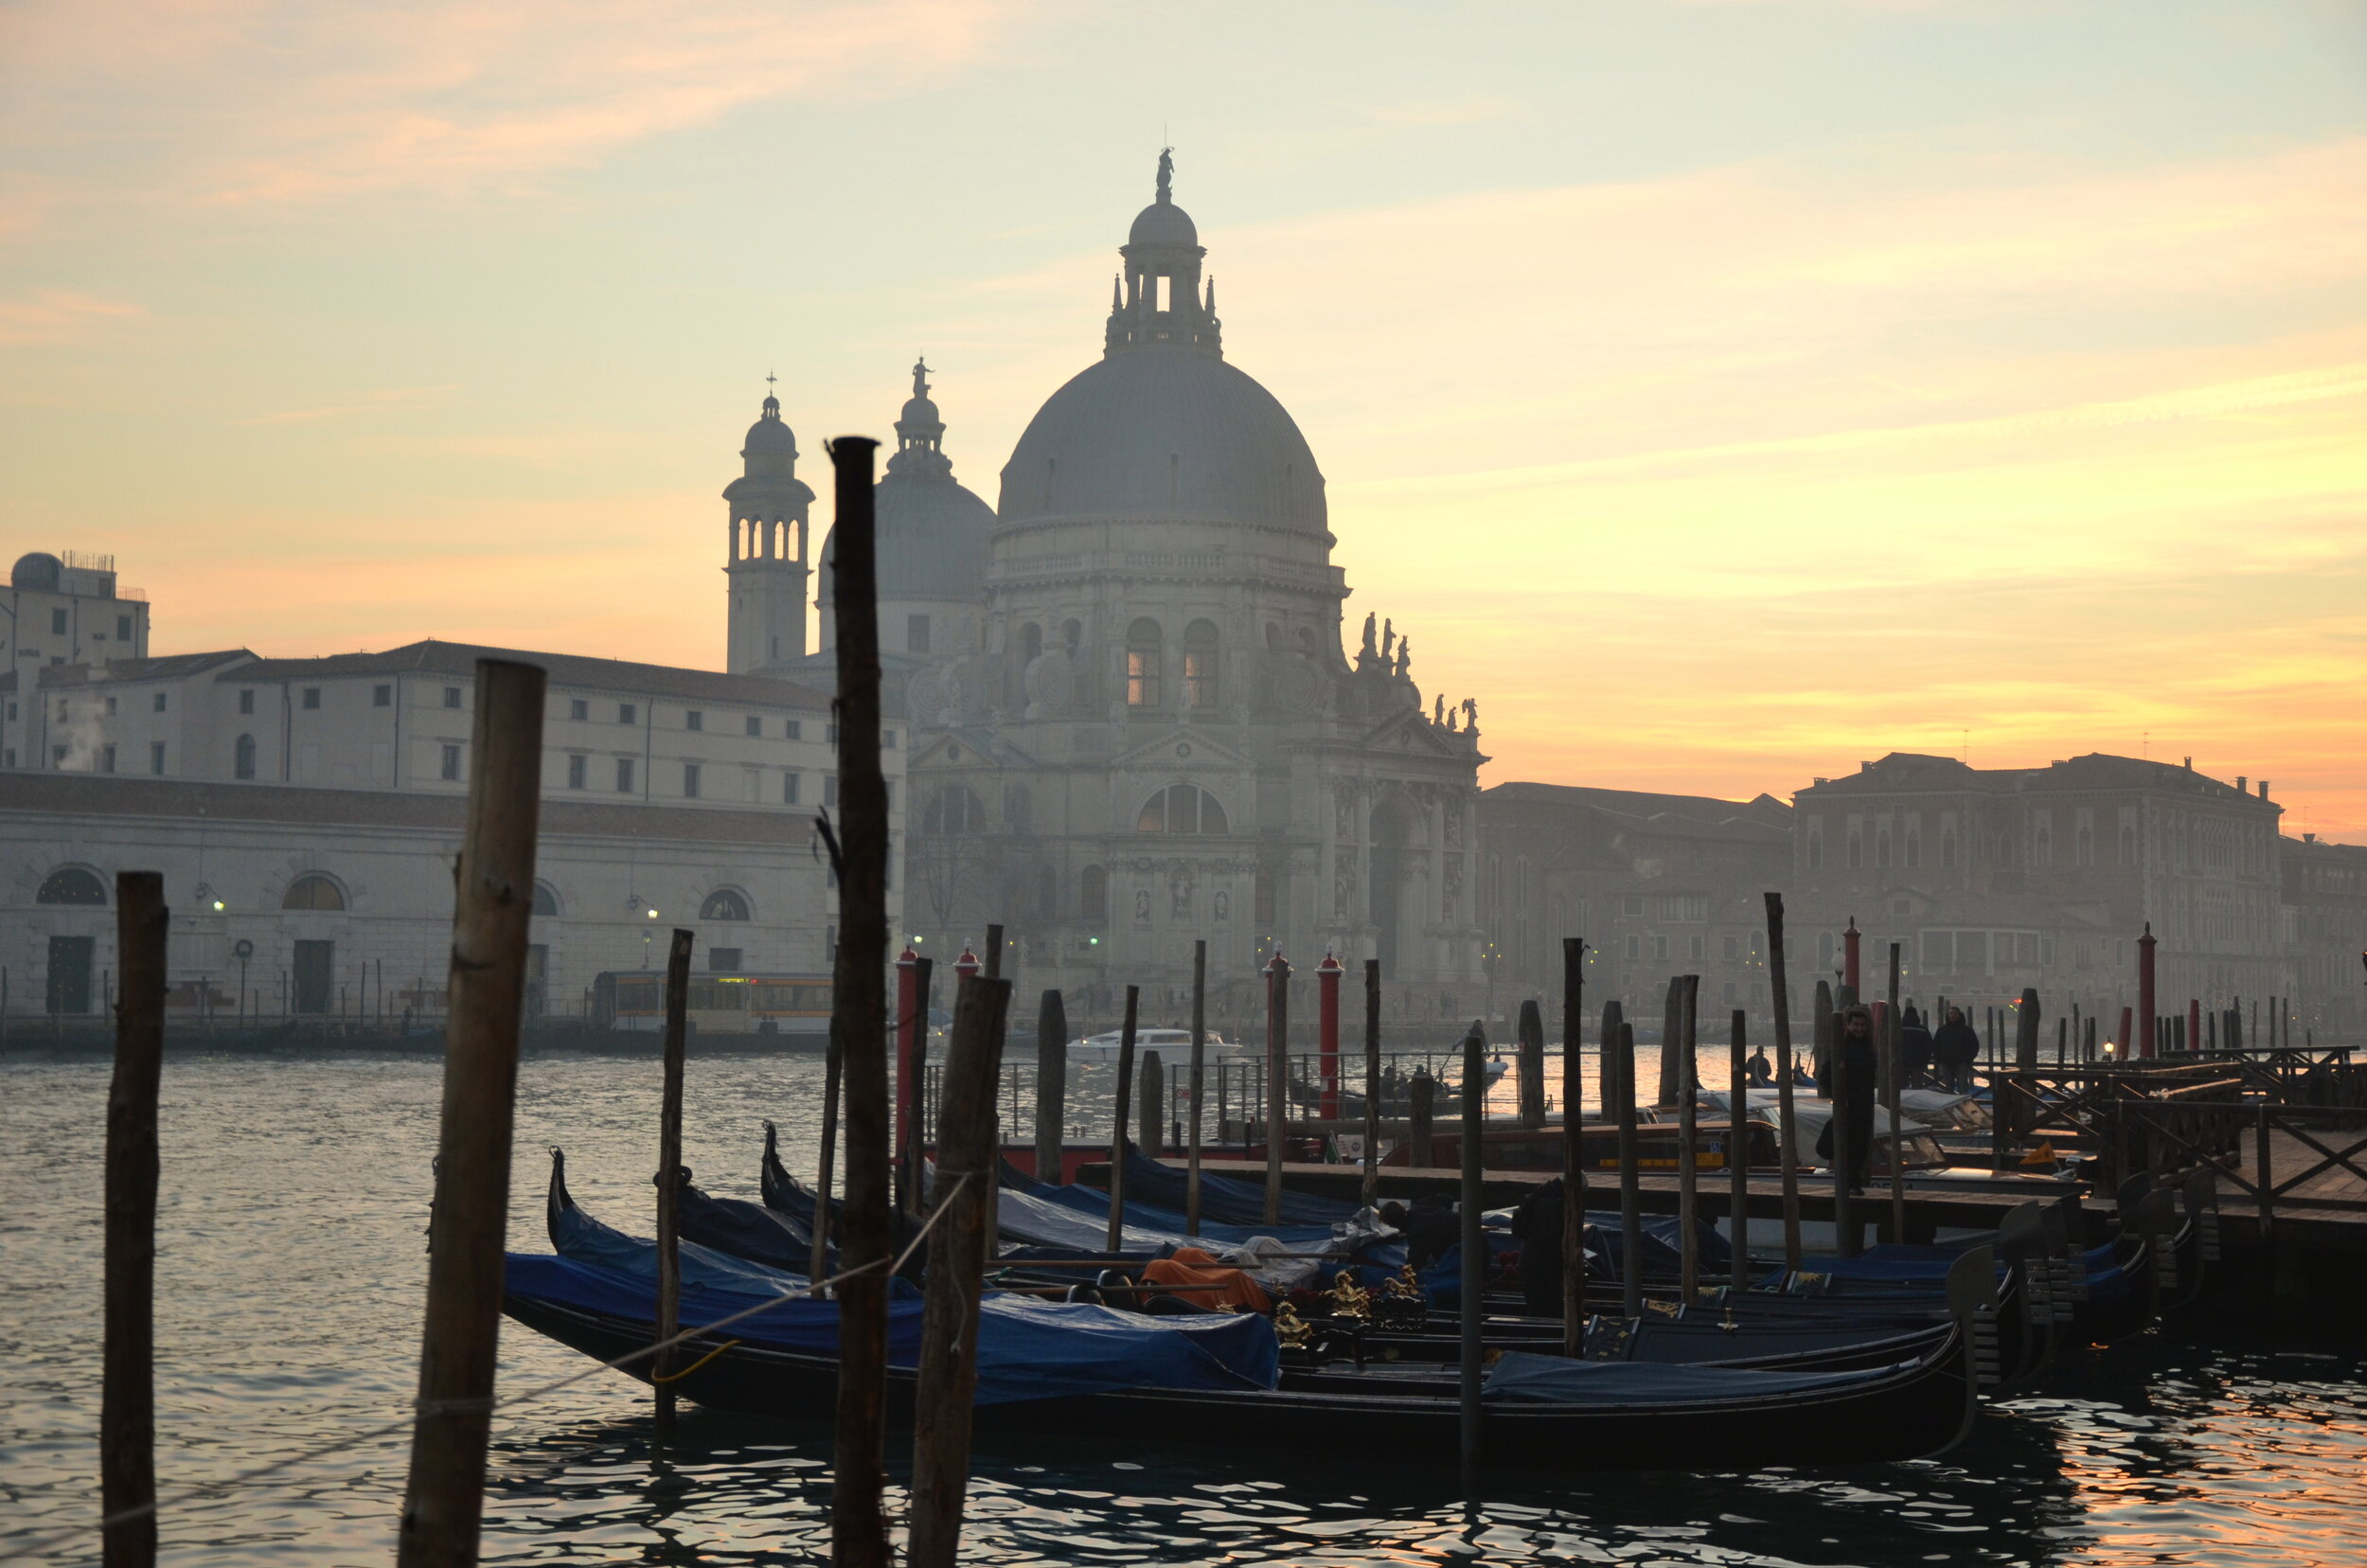 Salute and Gondolas, Venice